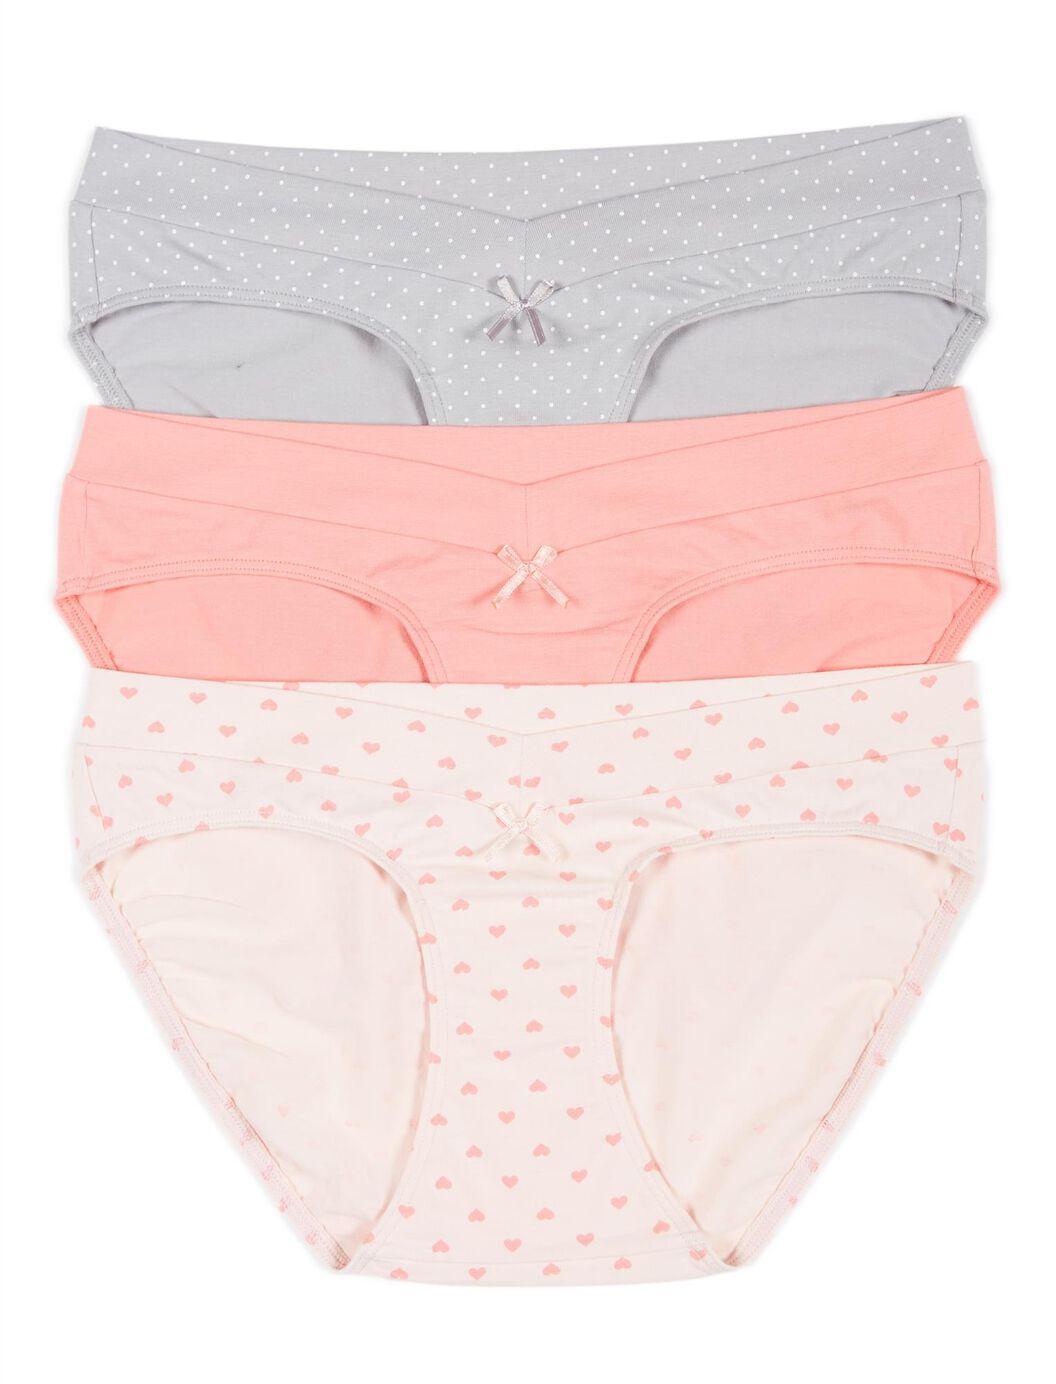 Maternity Hipster Panties (3 Pack)- Dot/Heart at Motherhood Maternity in Victor, NY   Tuggl